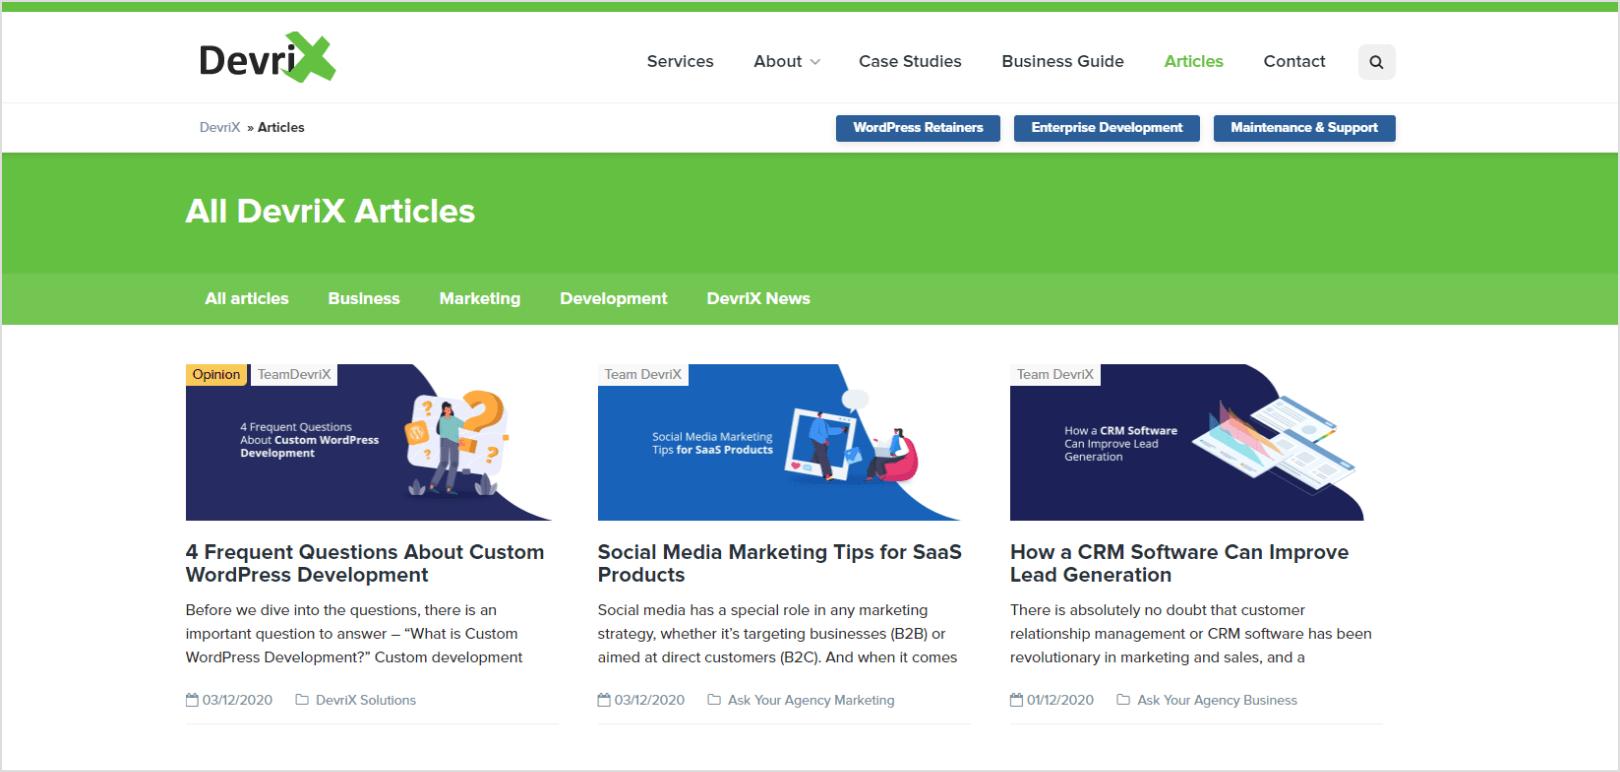 DevriX articles page screenshot